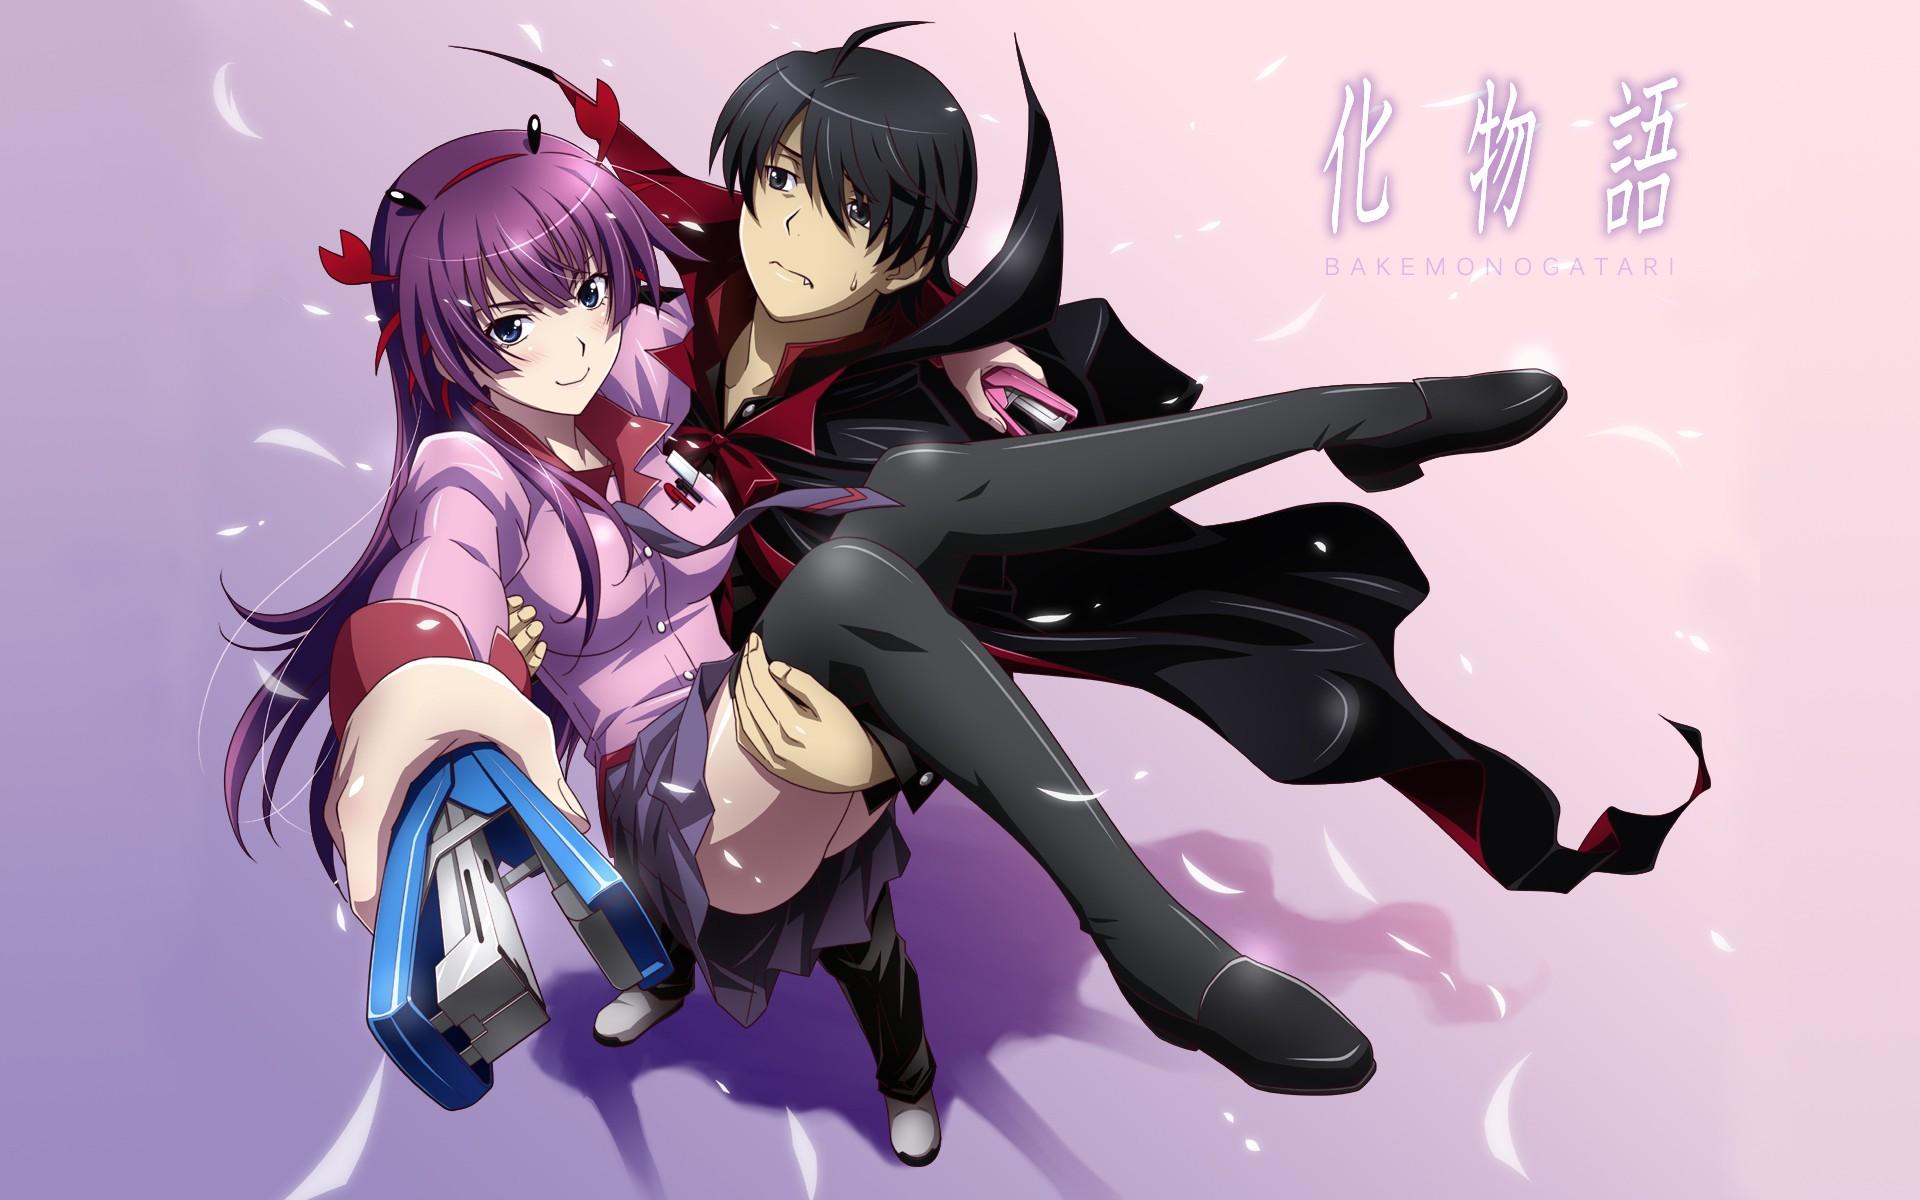 Anime 1920x1200 anime Monogatari Series Senjougahara Hitagi Araragi Koyomi thigh-highs